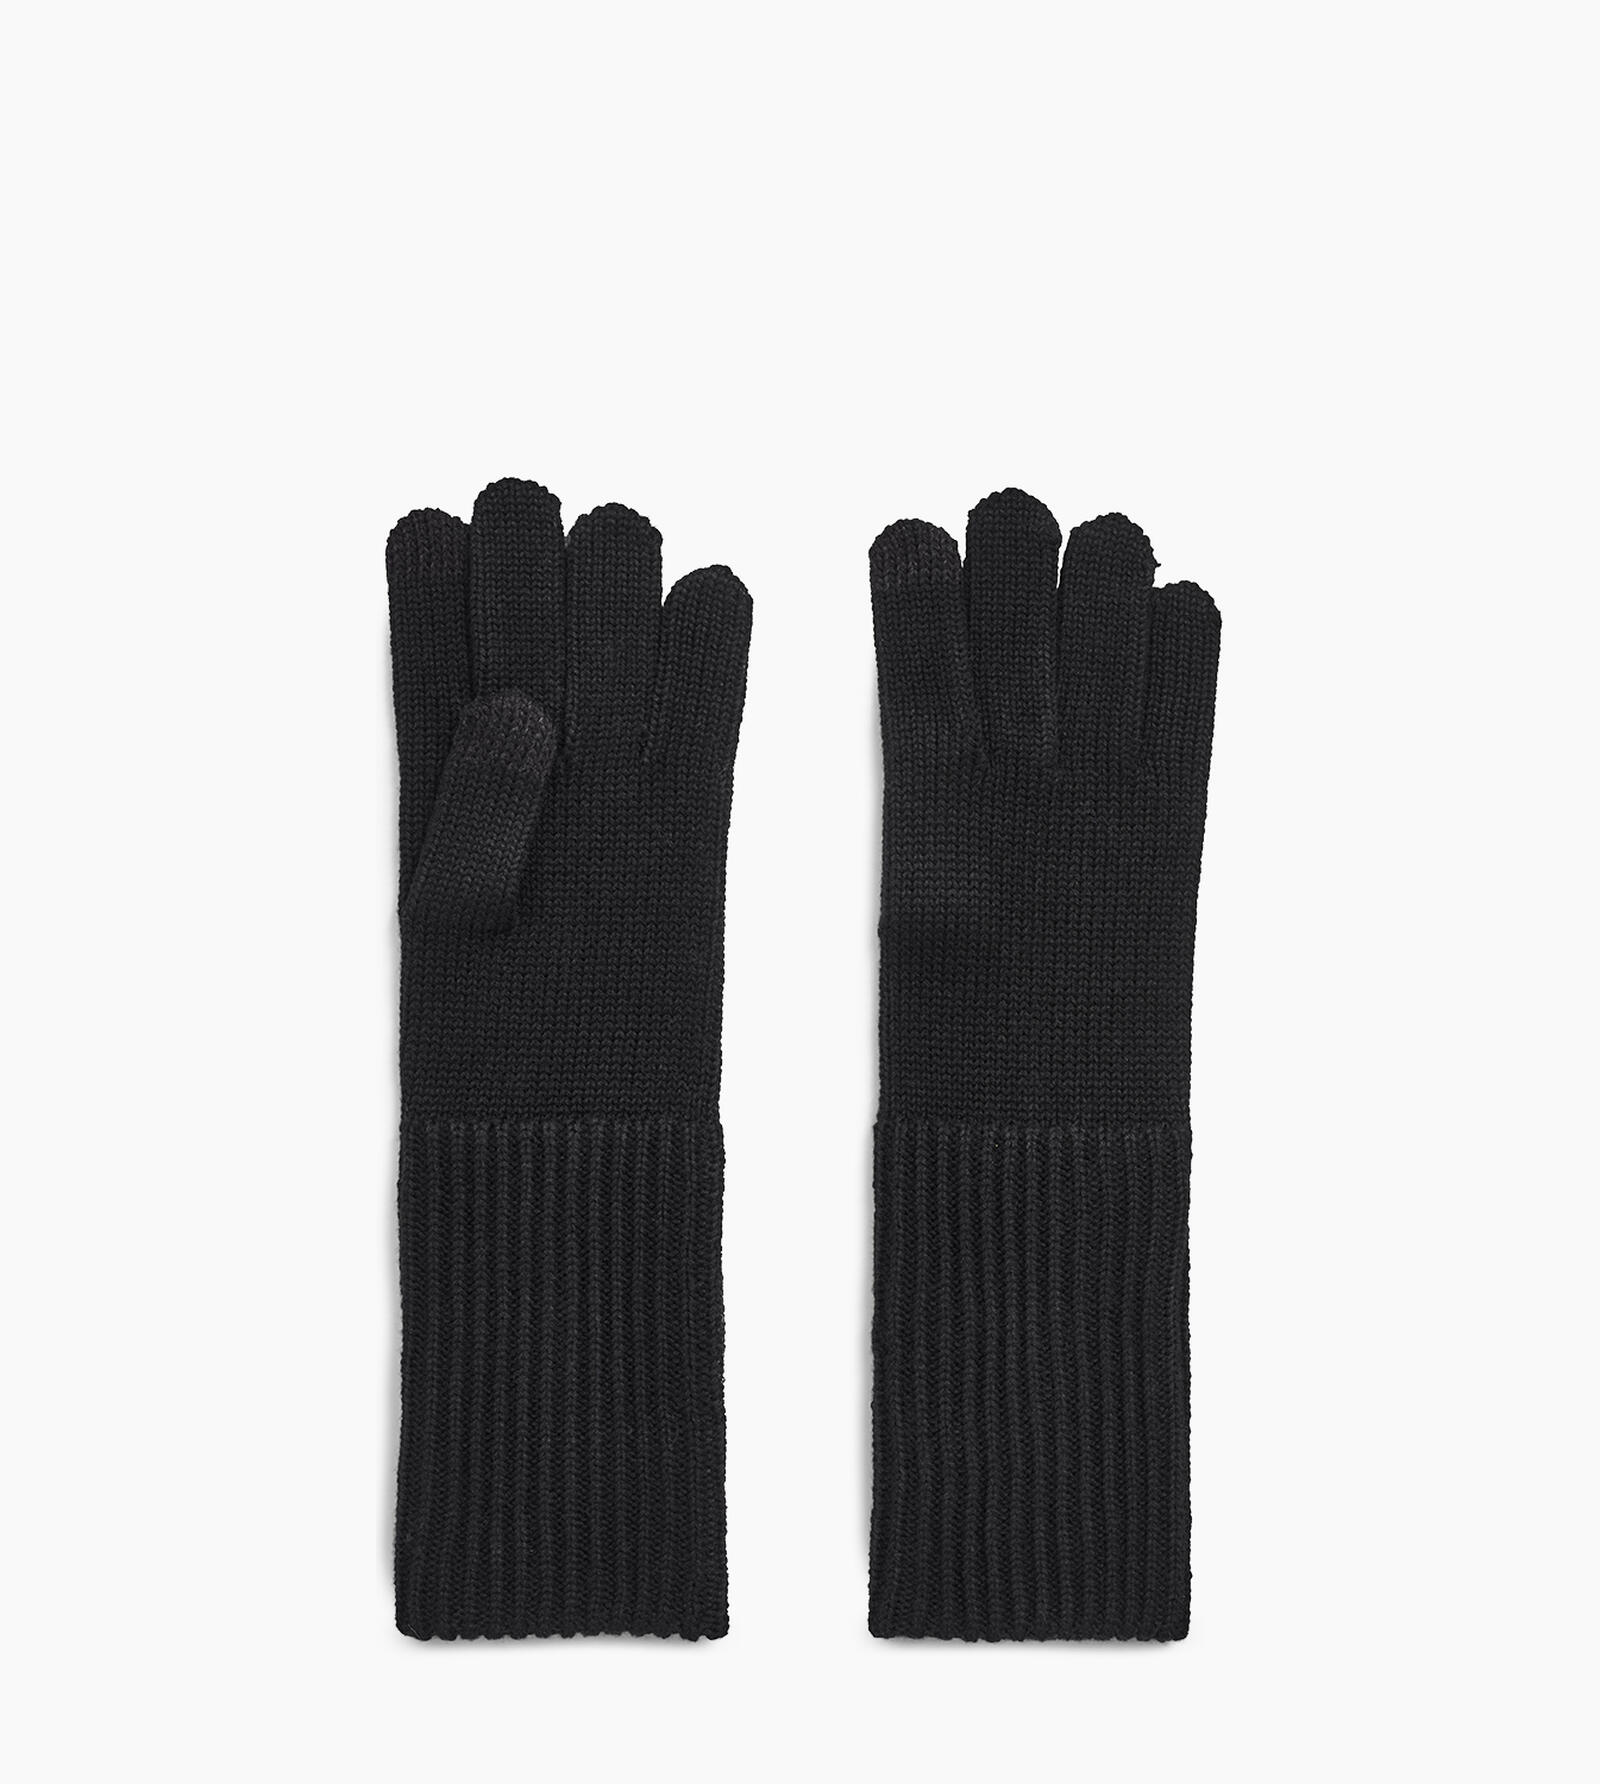 Full Knit Glove